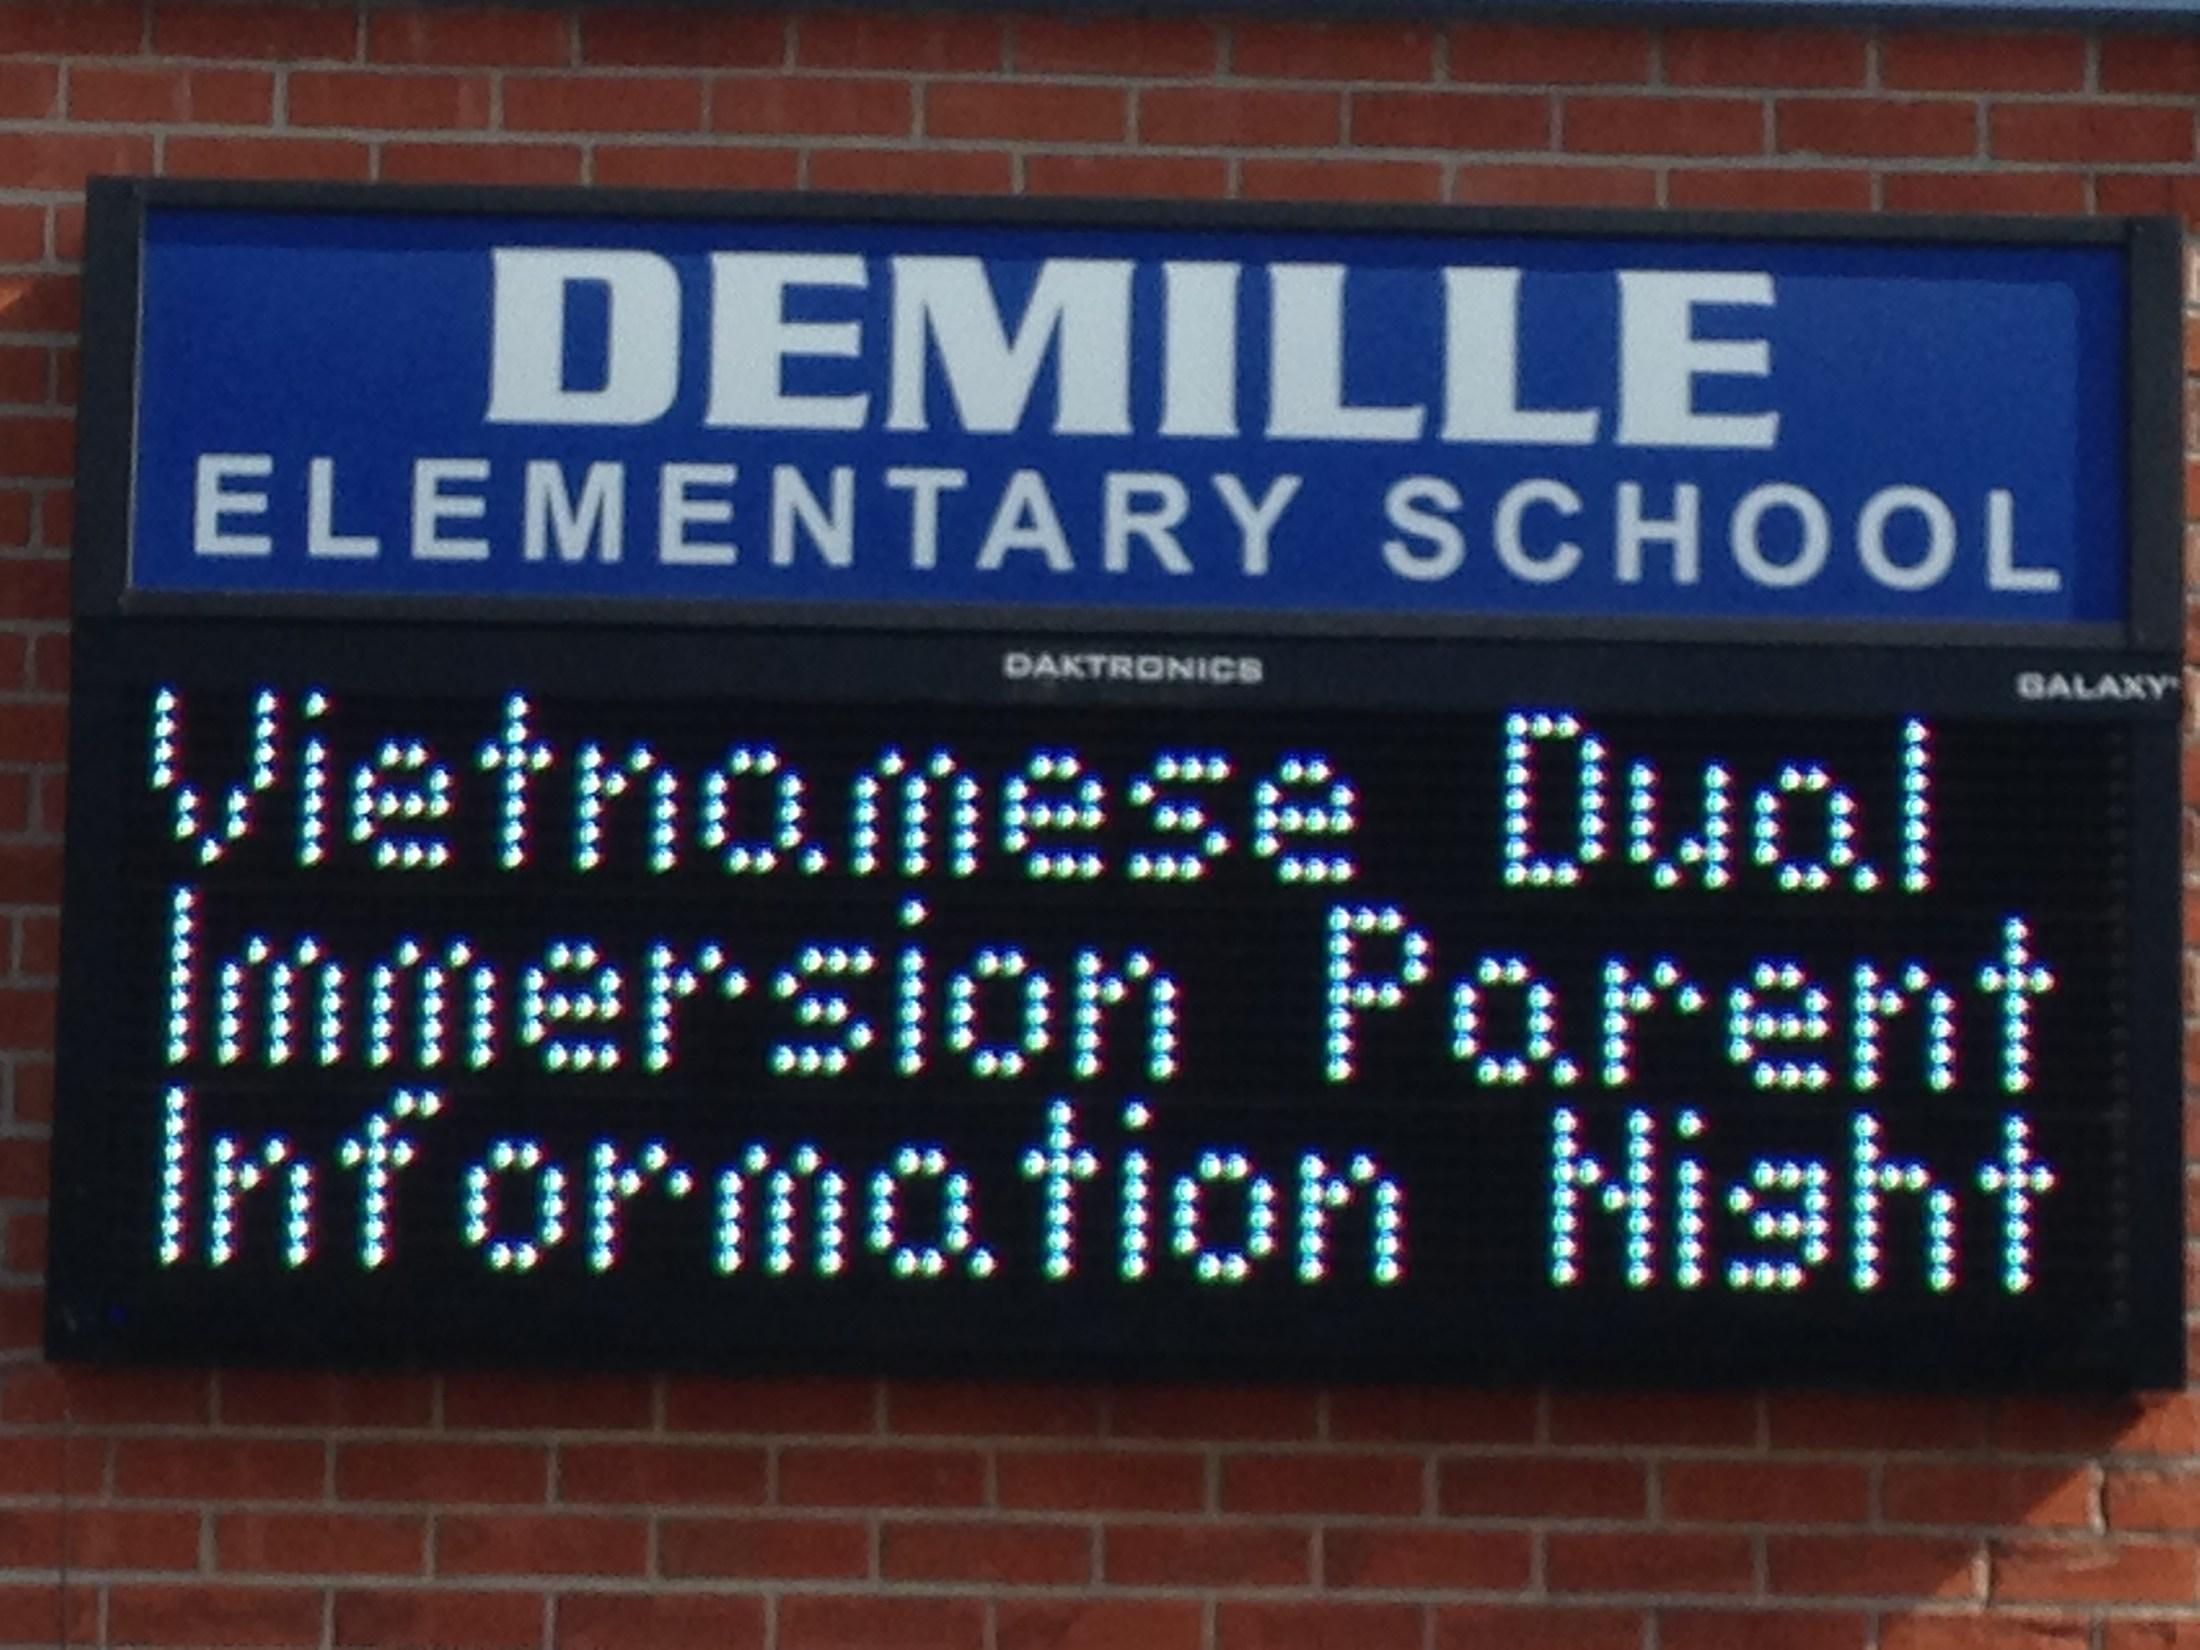 DeMille Elementary School Marquee